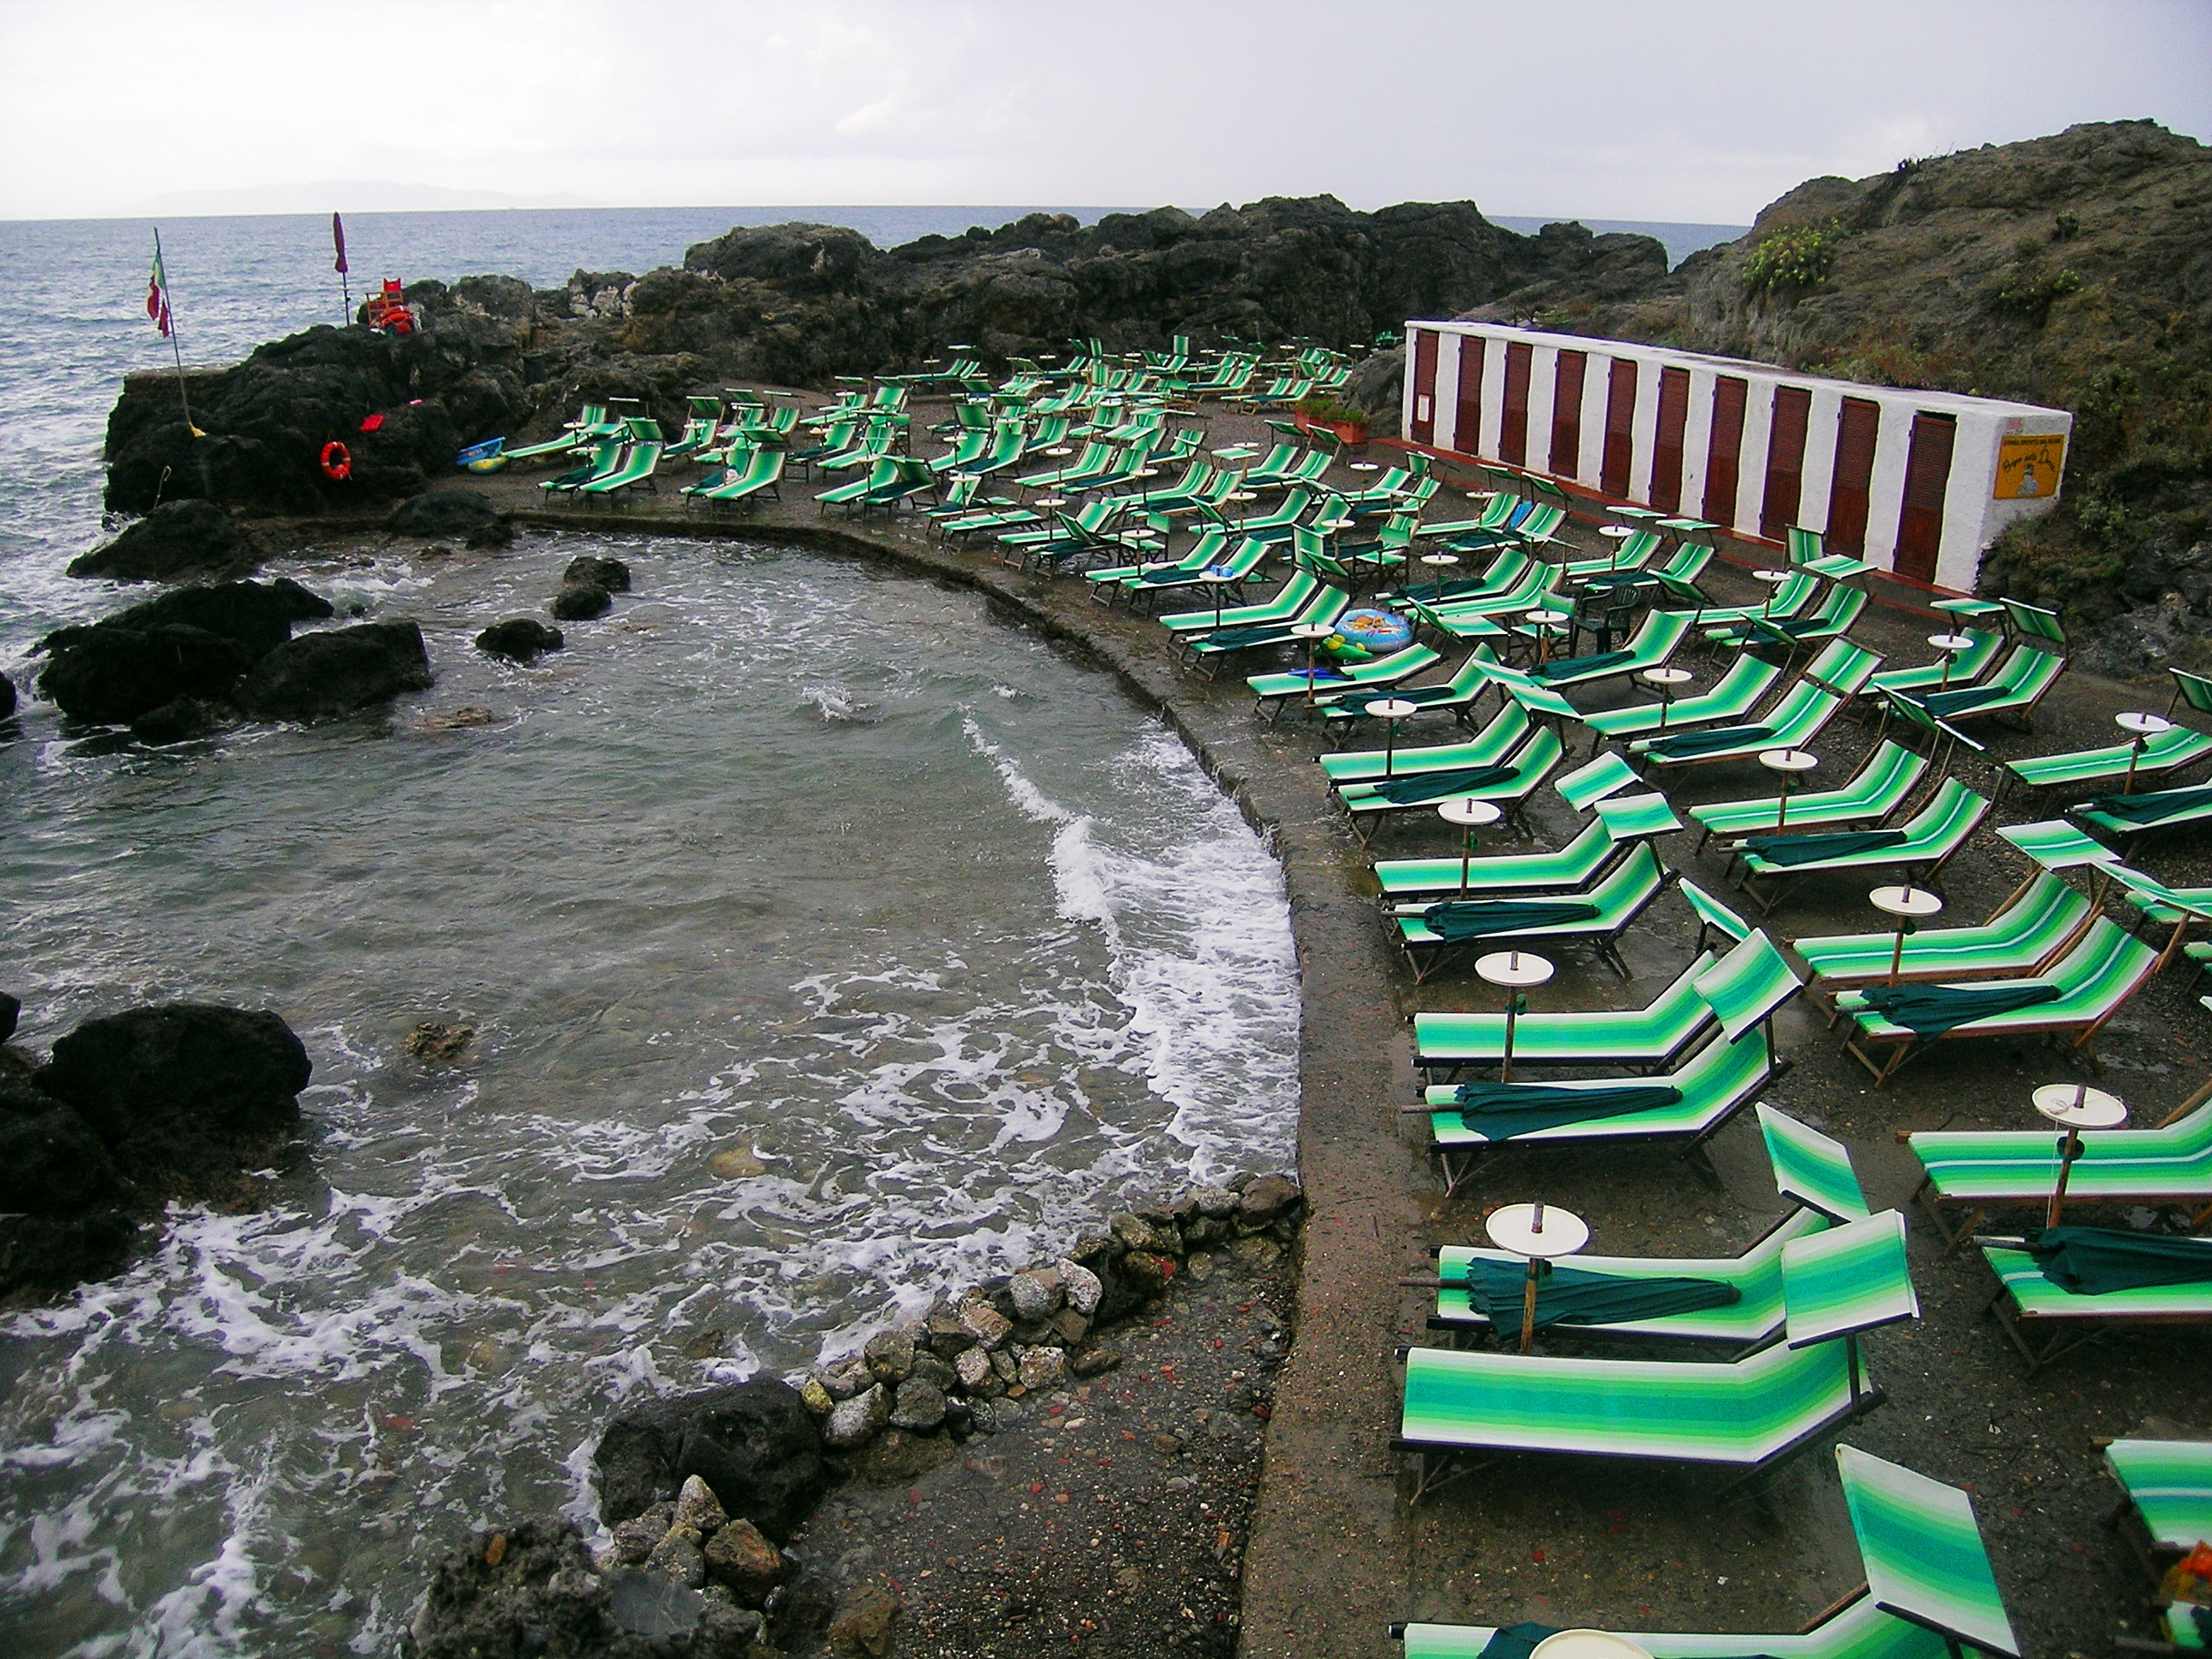 File talamone bagno donne wikimedia commons - Ragazze spiate in bagno ...